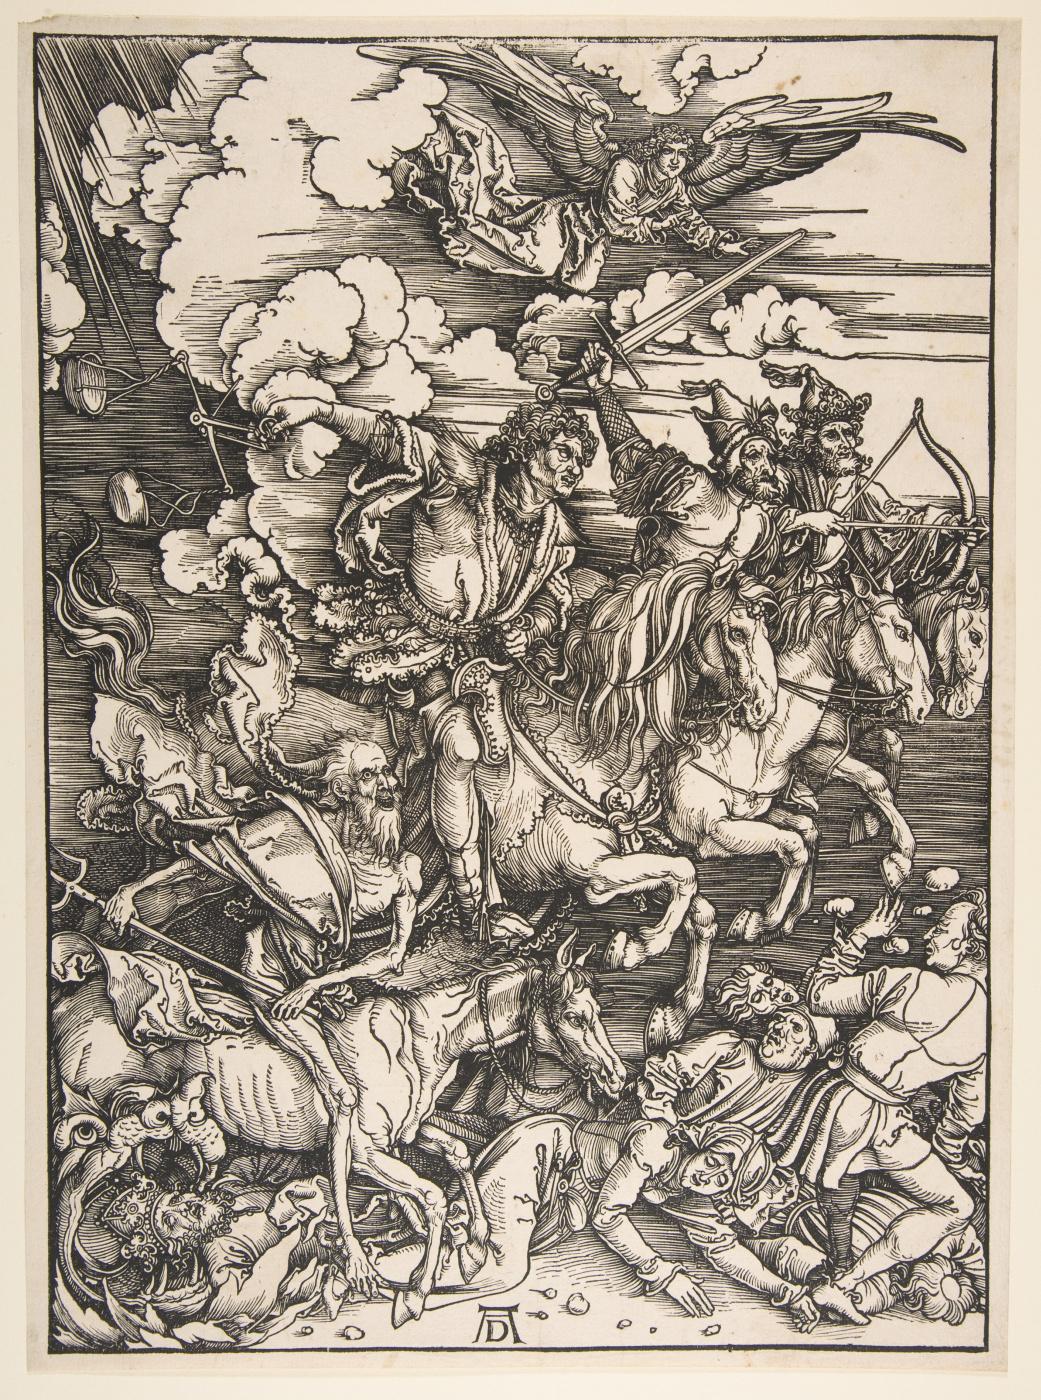 Albrecht Durer. The four horsemen of the Apocalypse.From the series the Apocalypse.